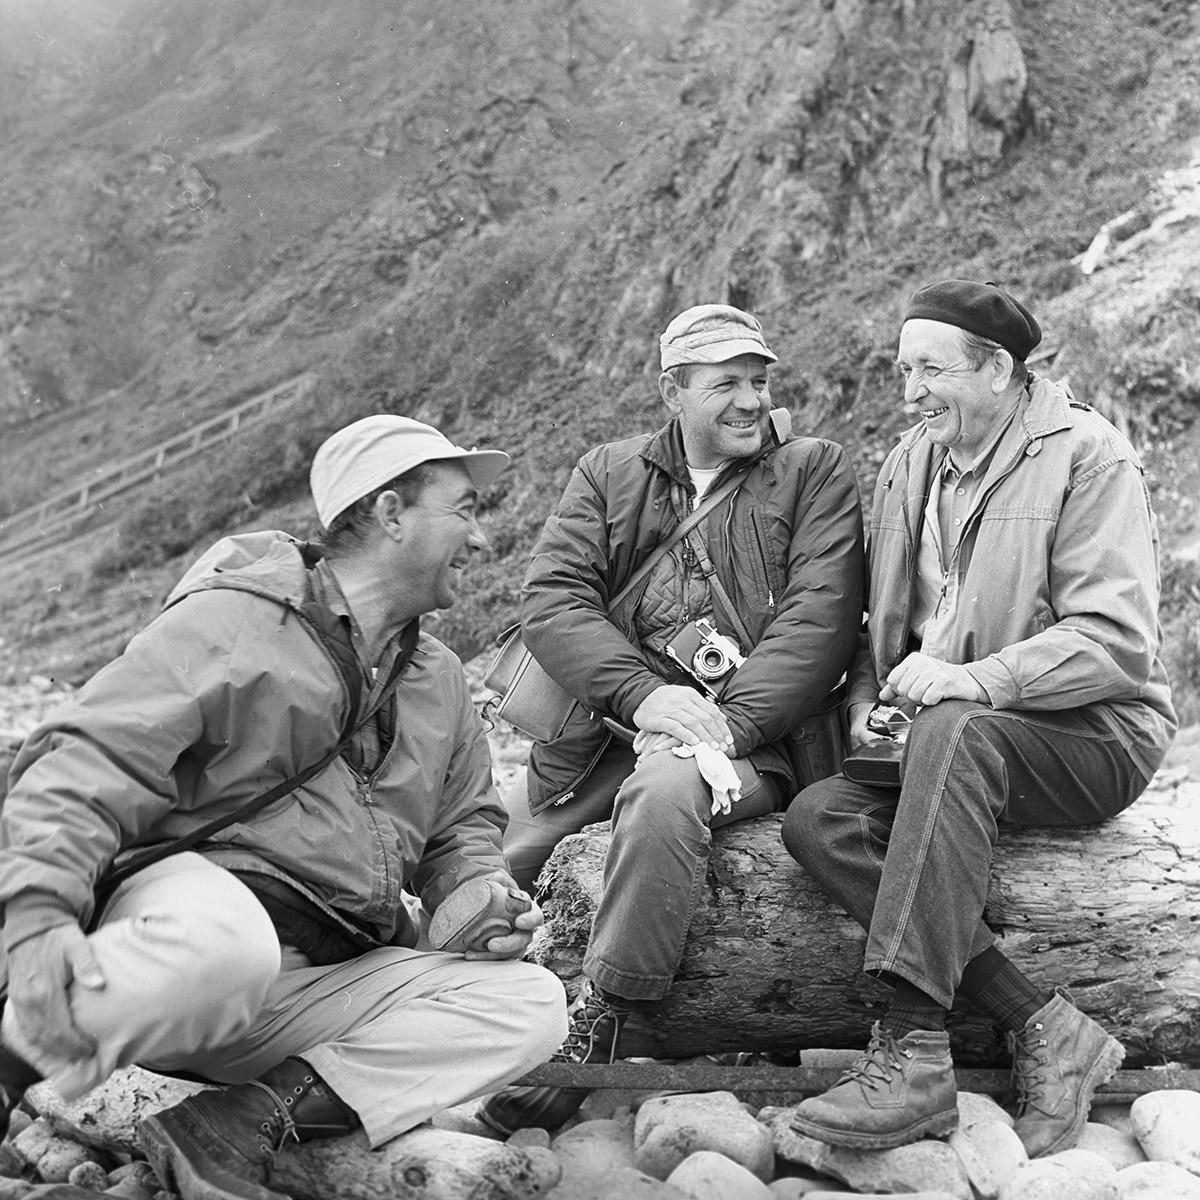 Američki znanstvenici Clifford Fiscus, Ansel Johnsom i kandidat bioloških znanosti, Viktor Arsenjjev (desno) na otoku Medni.